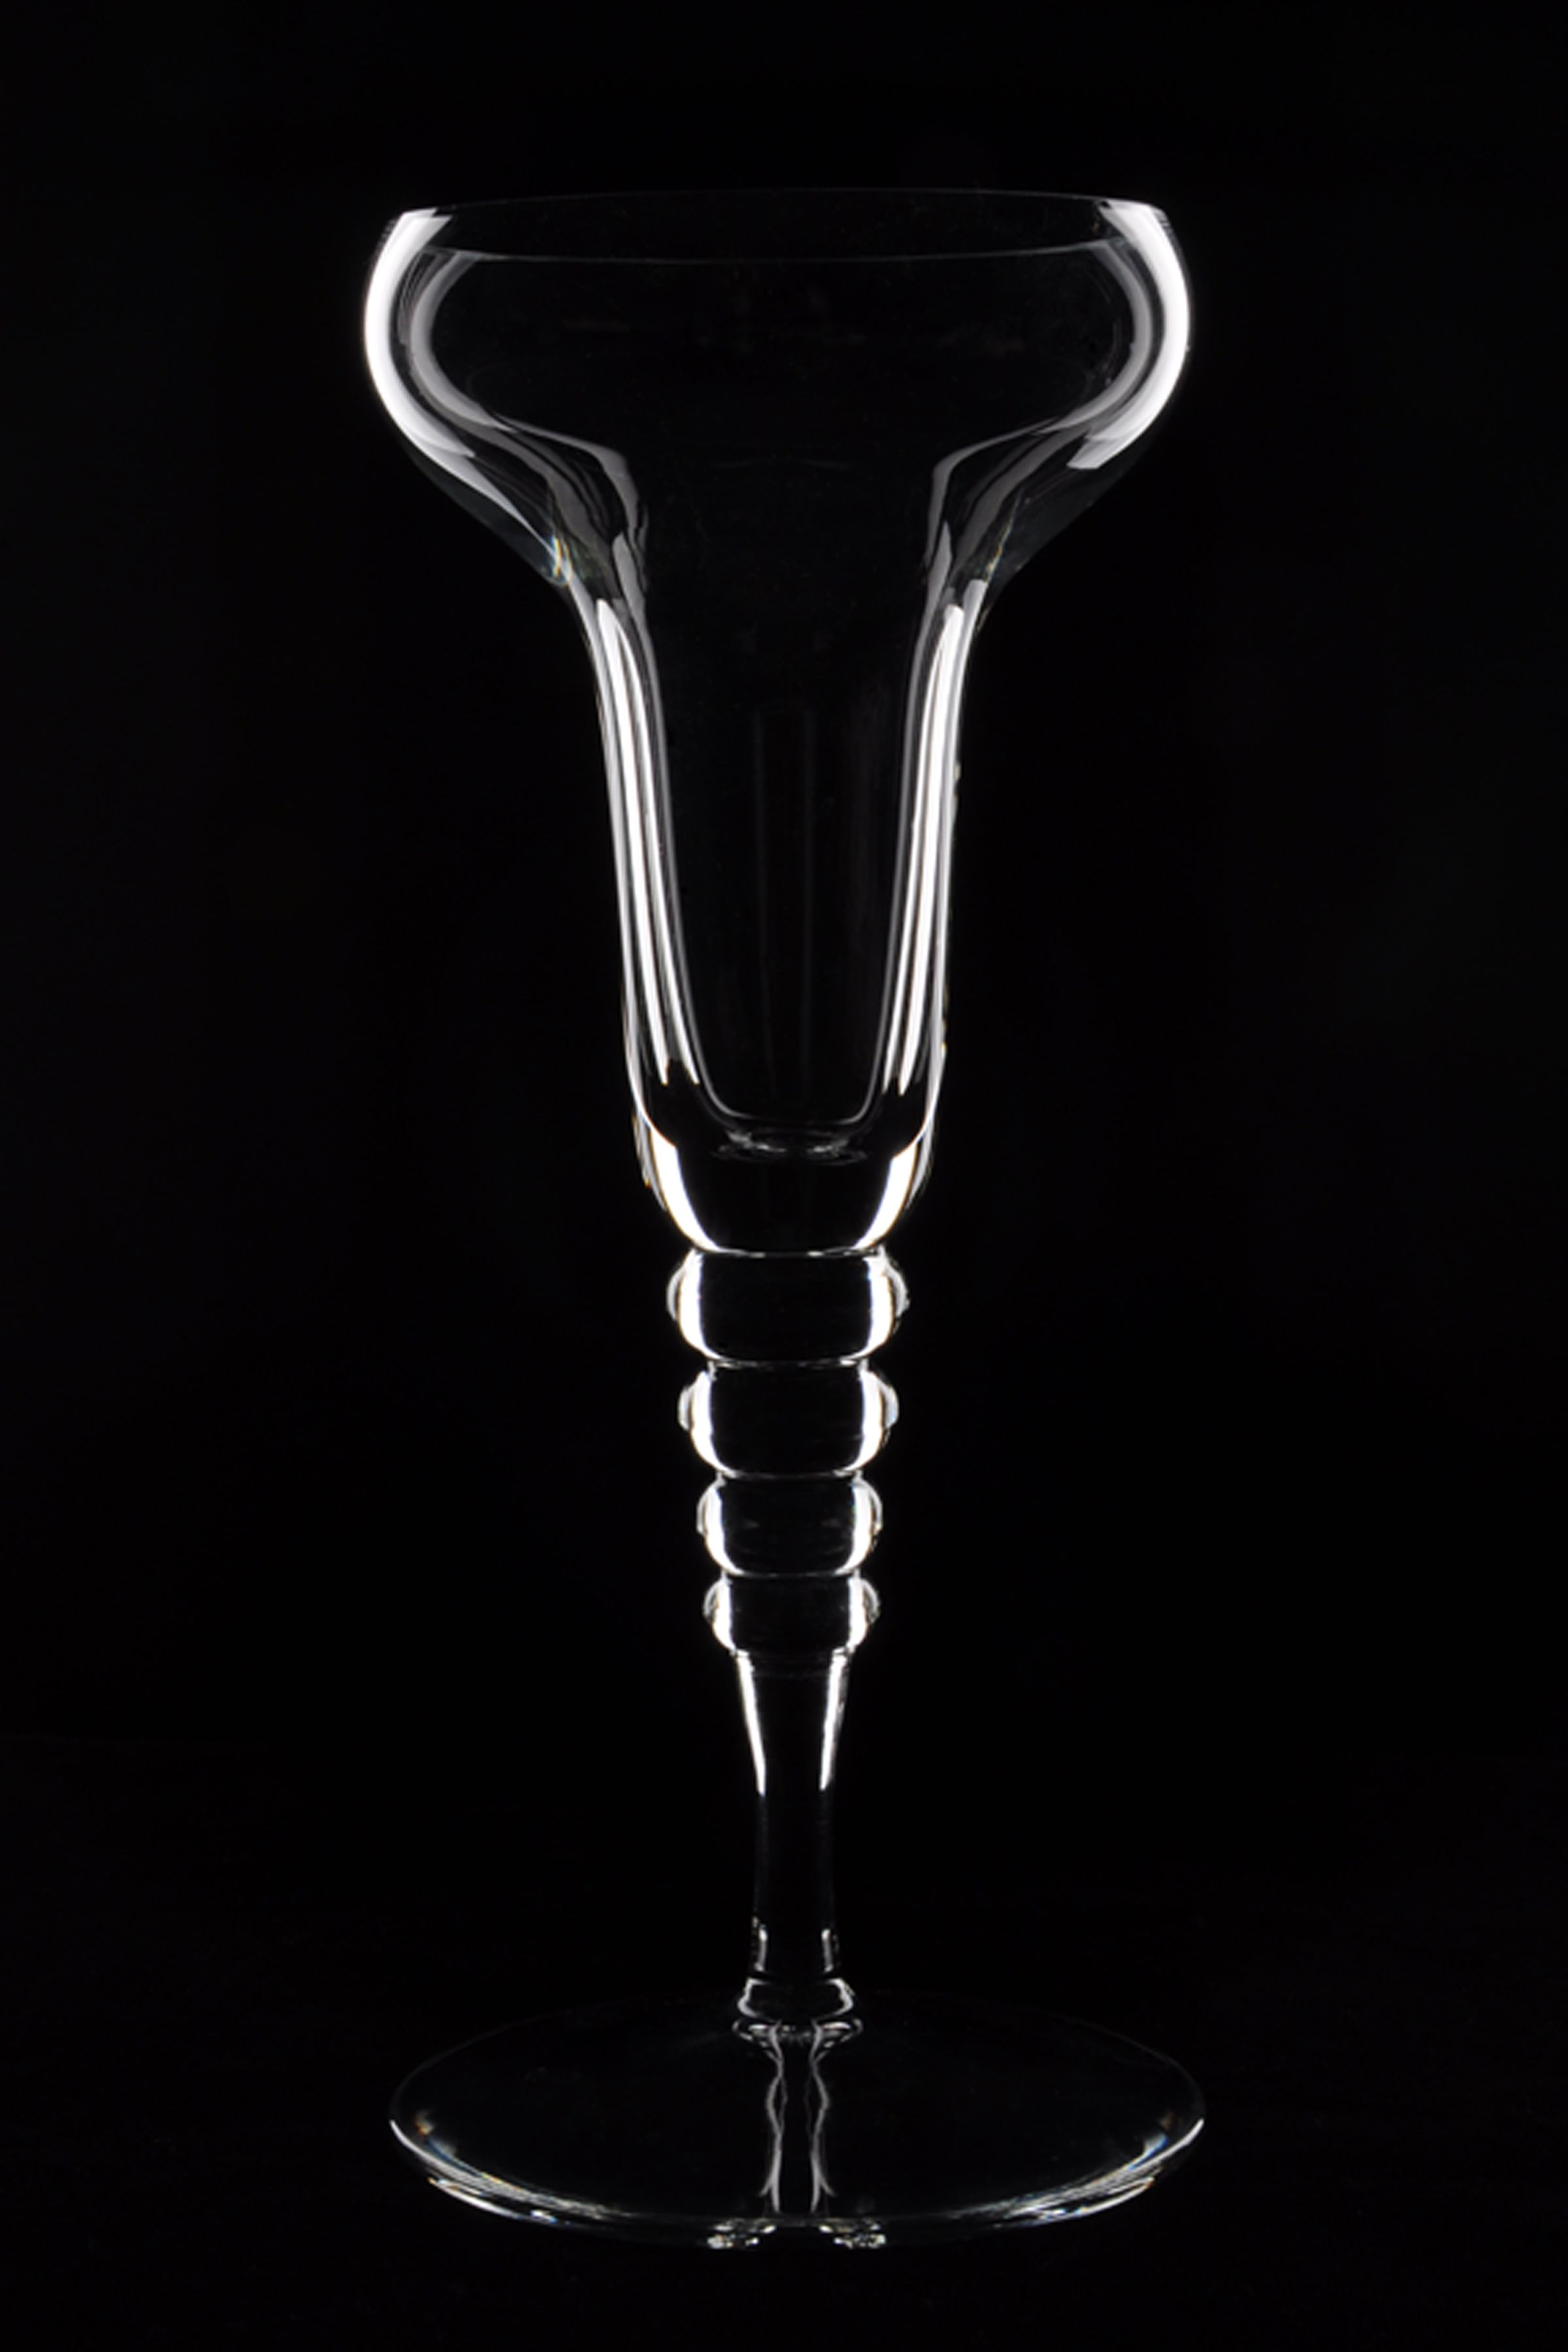 Tutorial lighting drinks and other product photography - Dark Field Lighting Glassware The Open Window Alumni Carmen Koetje Www Open Windowproduct Photographycarmen Goldsmith